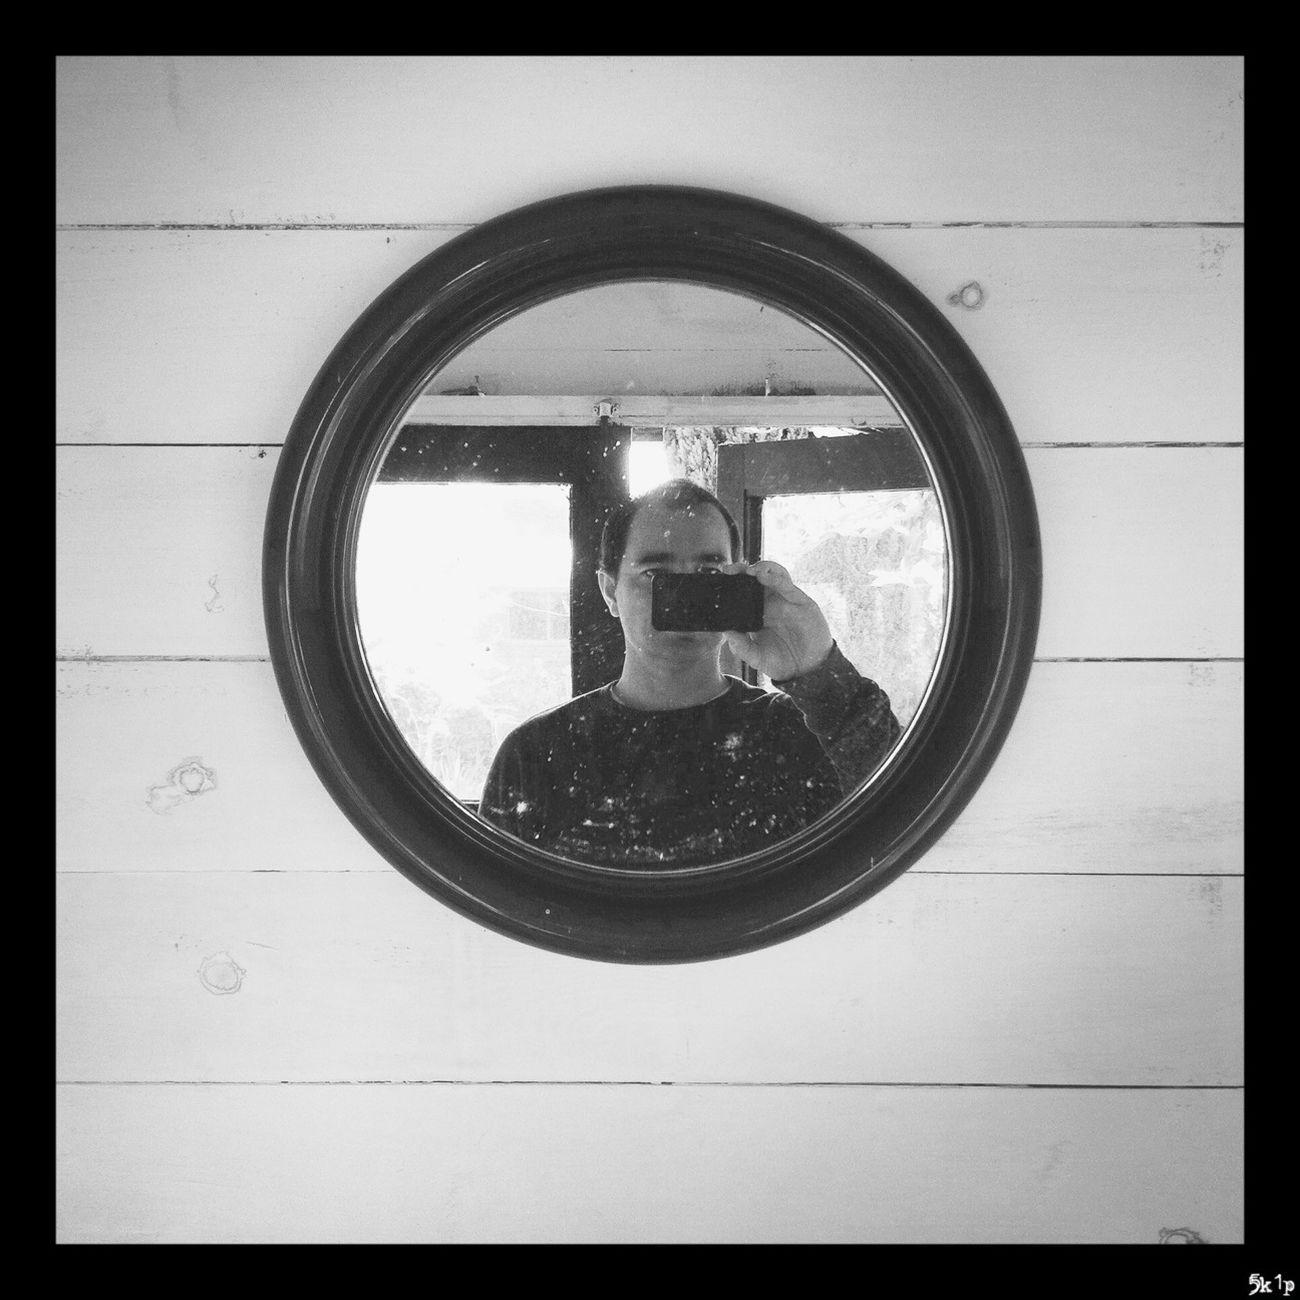 My annual selfie for EyeEm :-) Blackandwhite AMPt_community NEM Self Frame It!